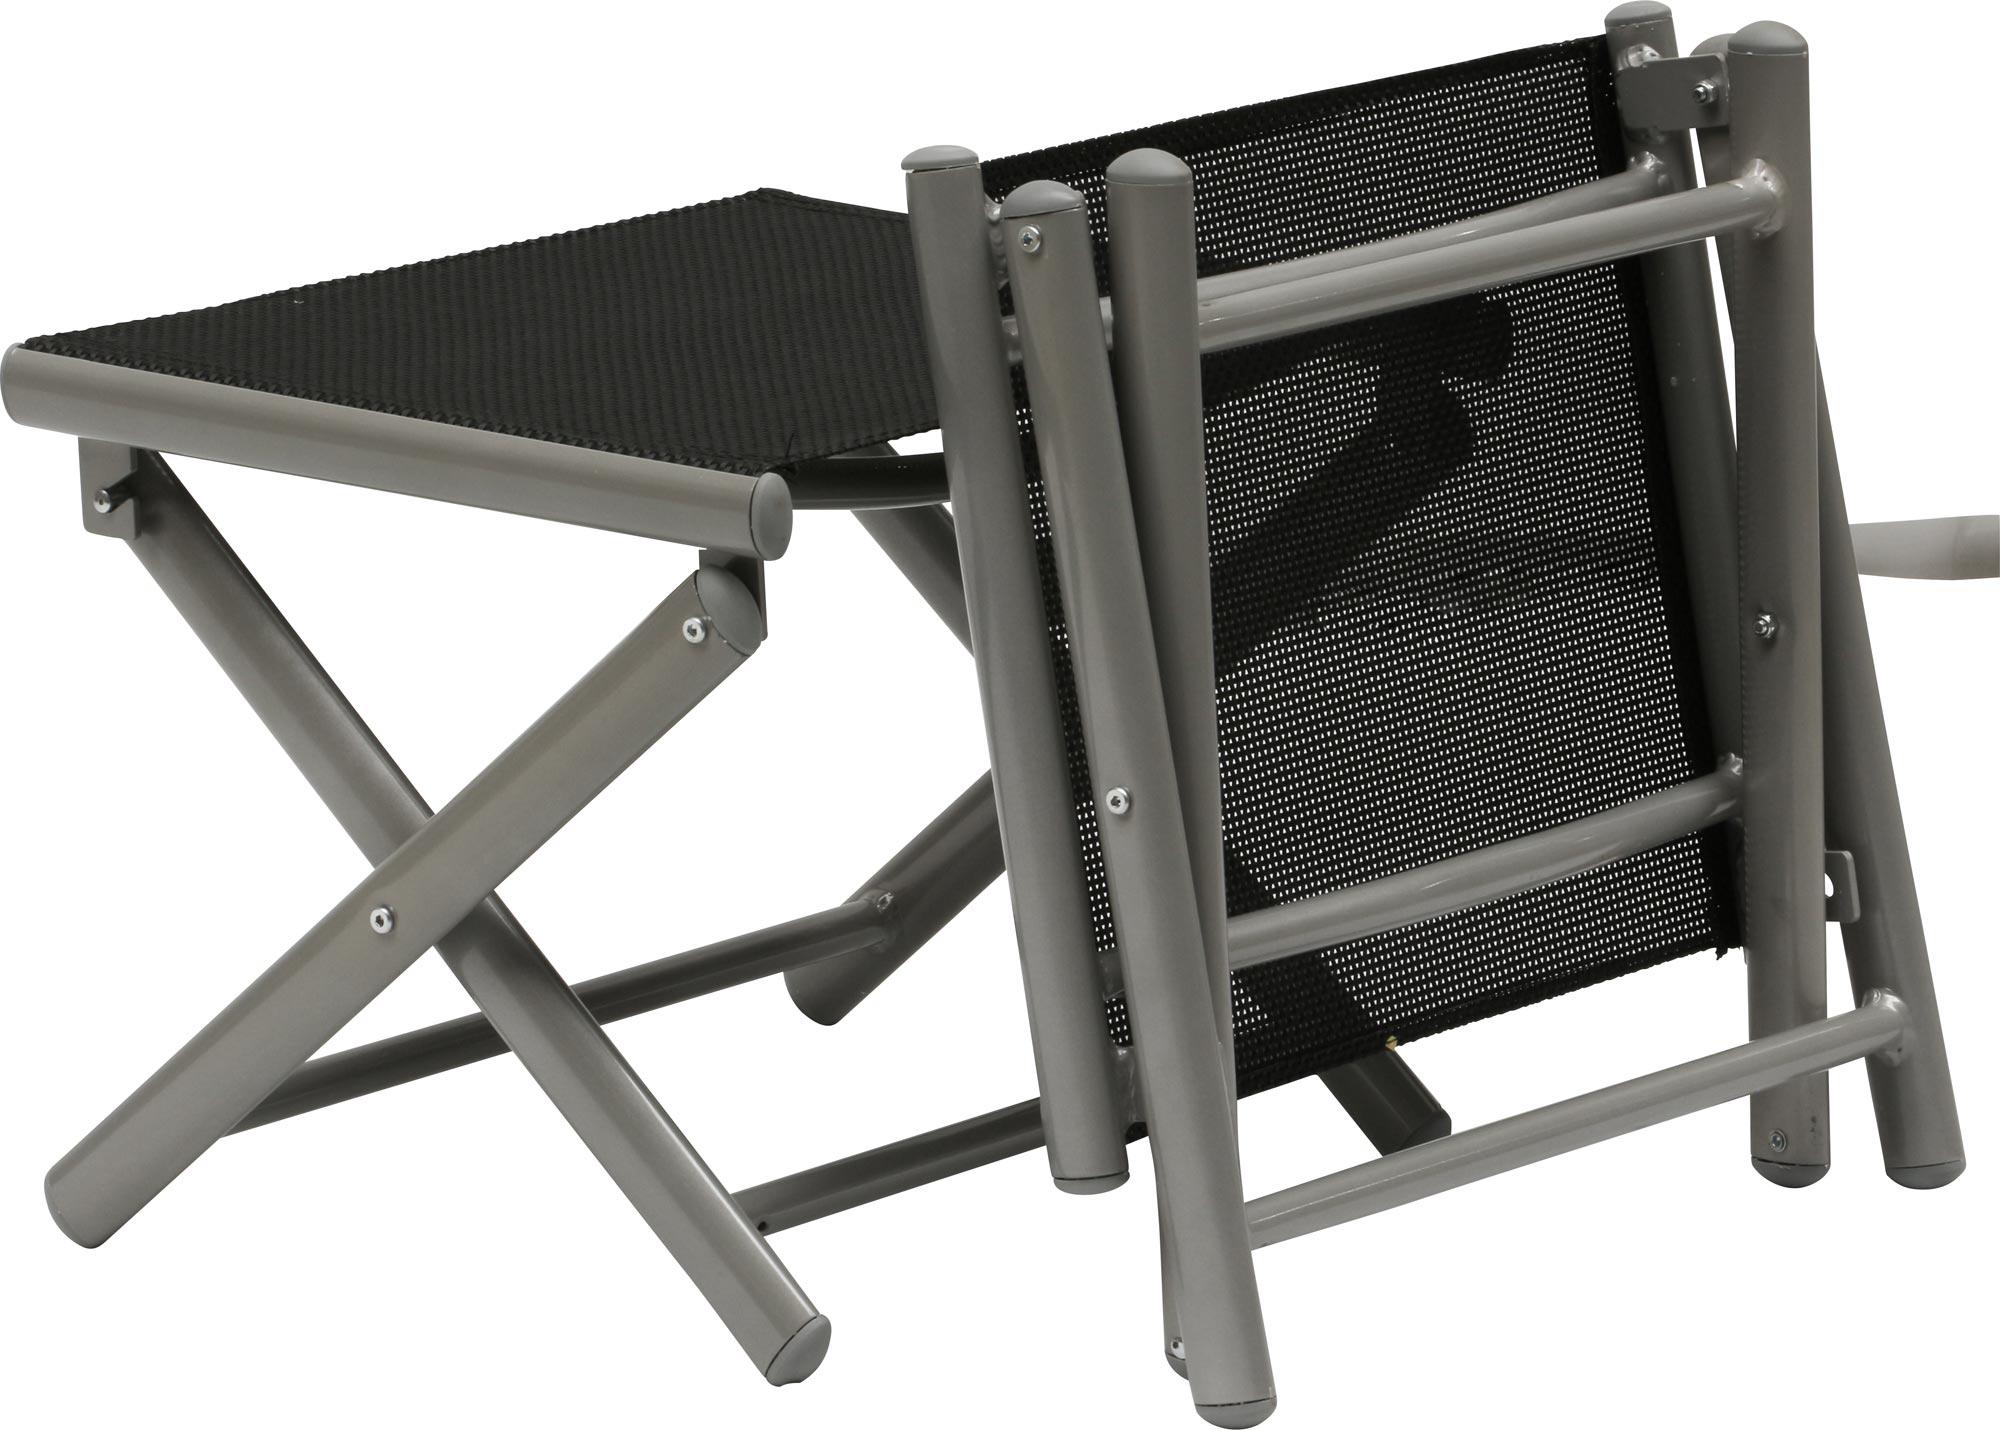 banc de pieds jamaica star alu noir salon de jardin chaise repose pieds ebay. Black Bedroom Furniture Sets. Home Design Ideas